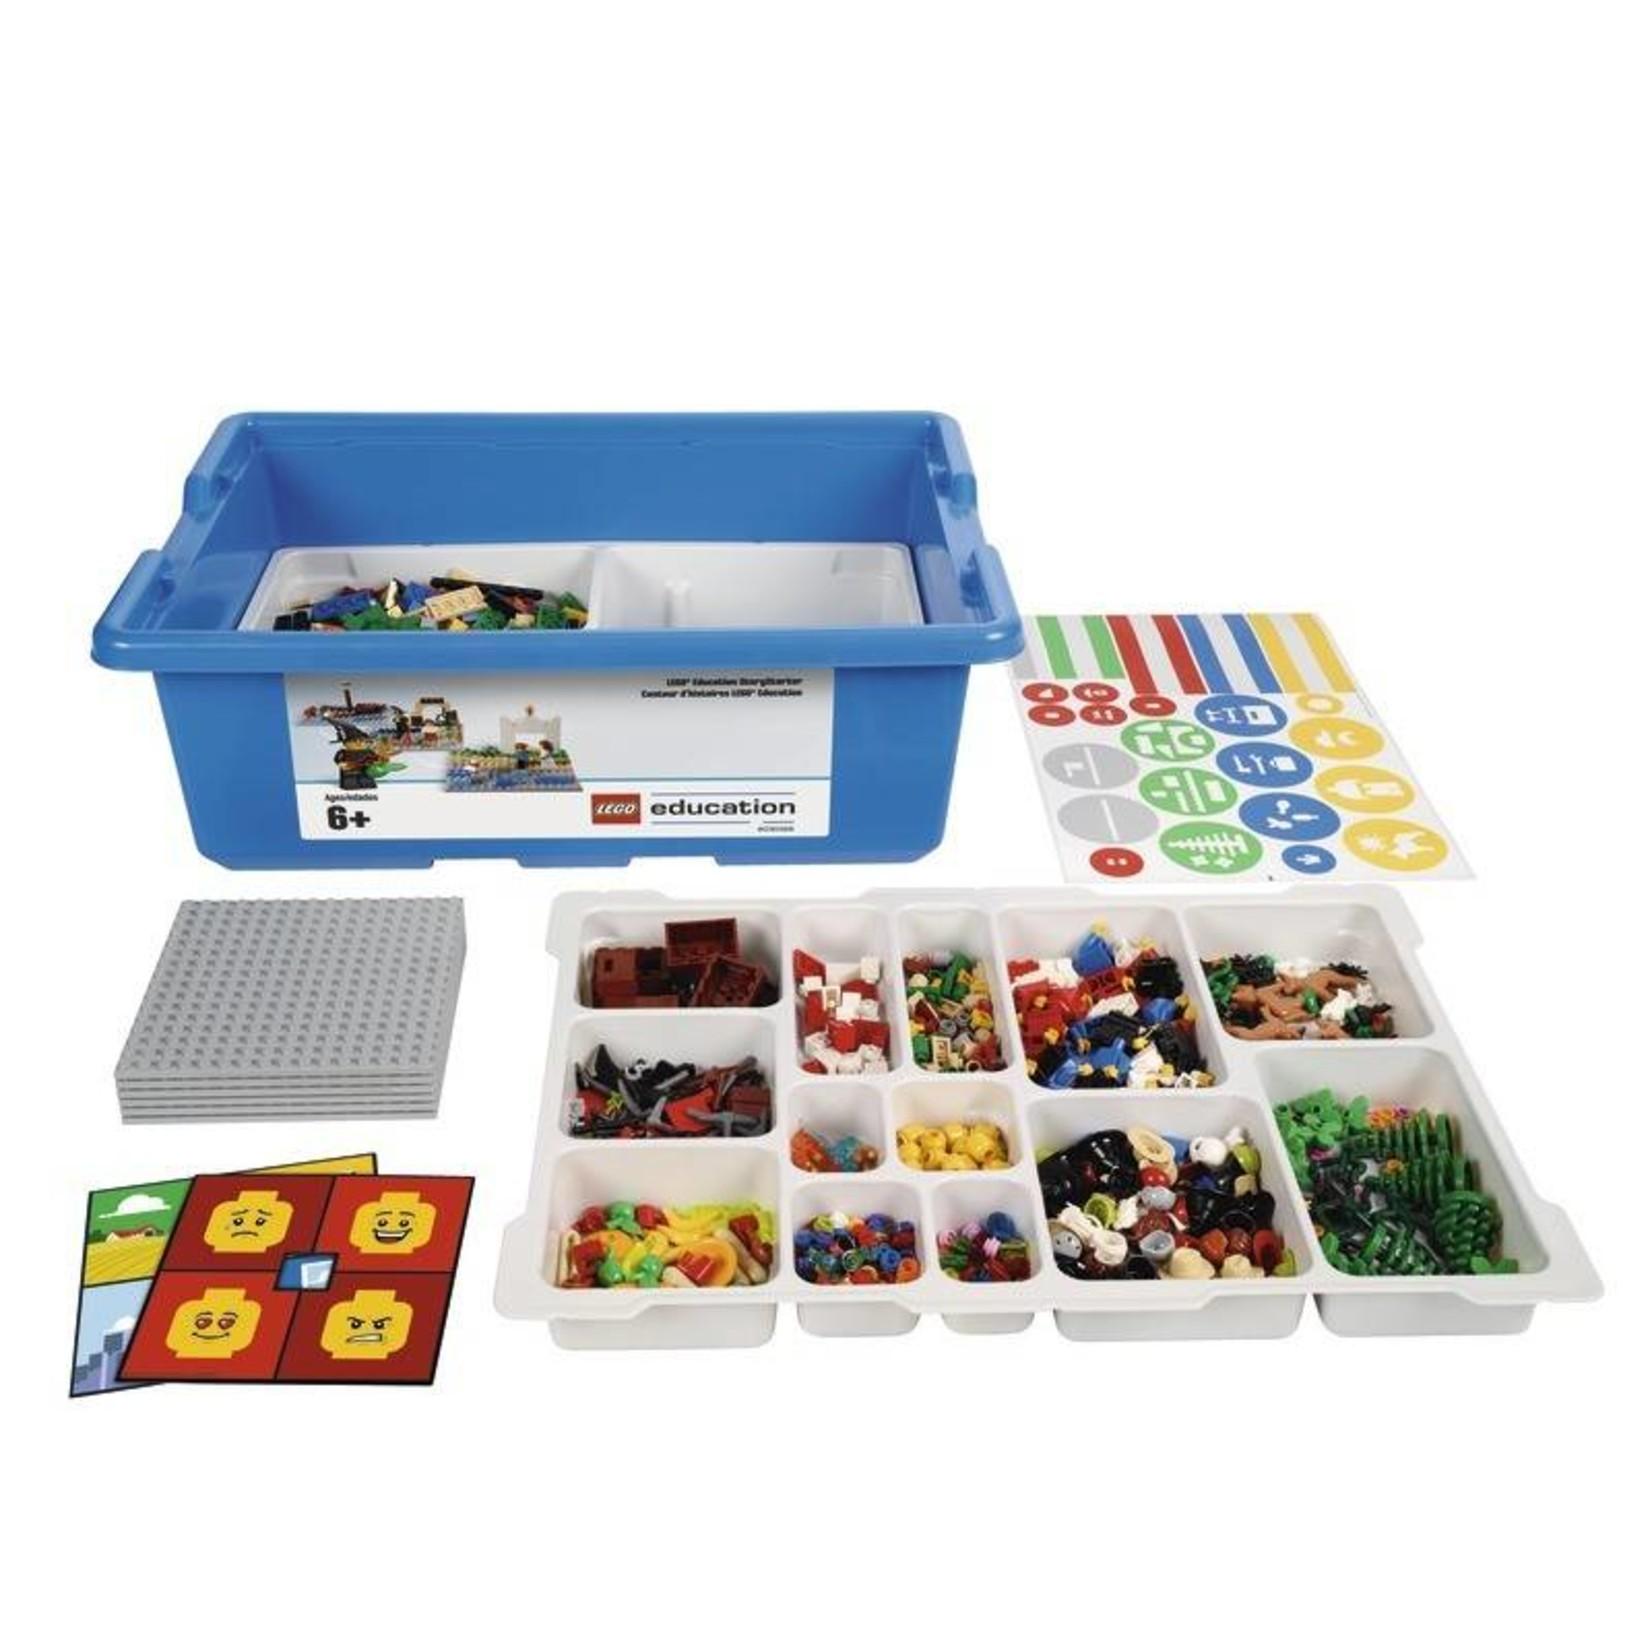 LEGO® Education StoryStarter core set